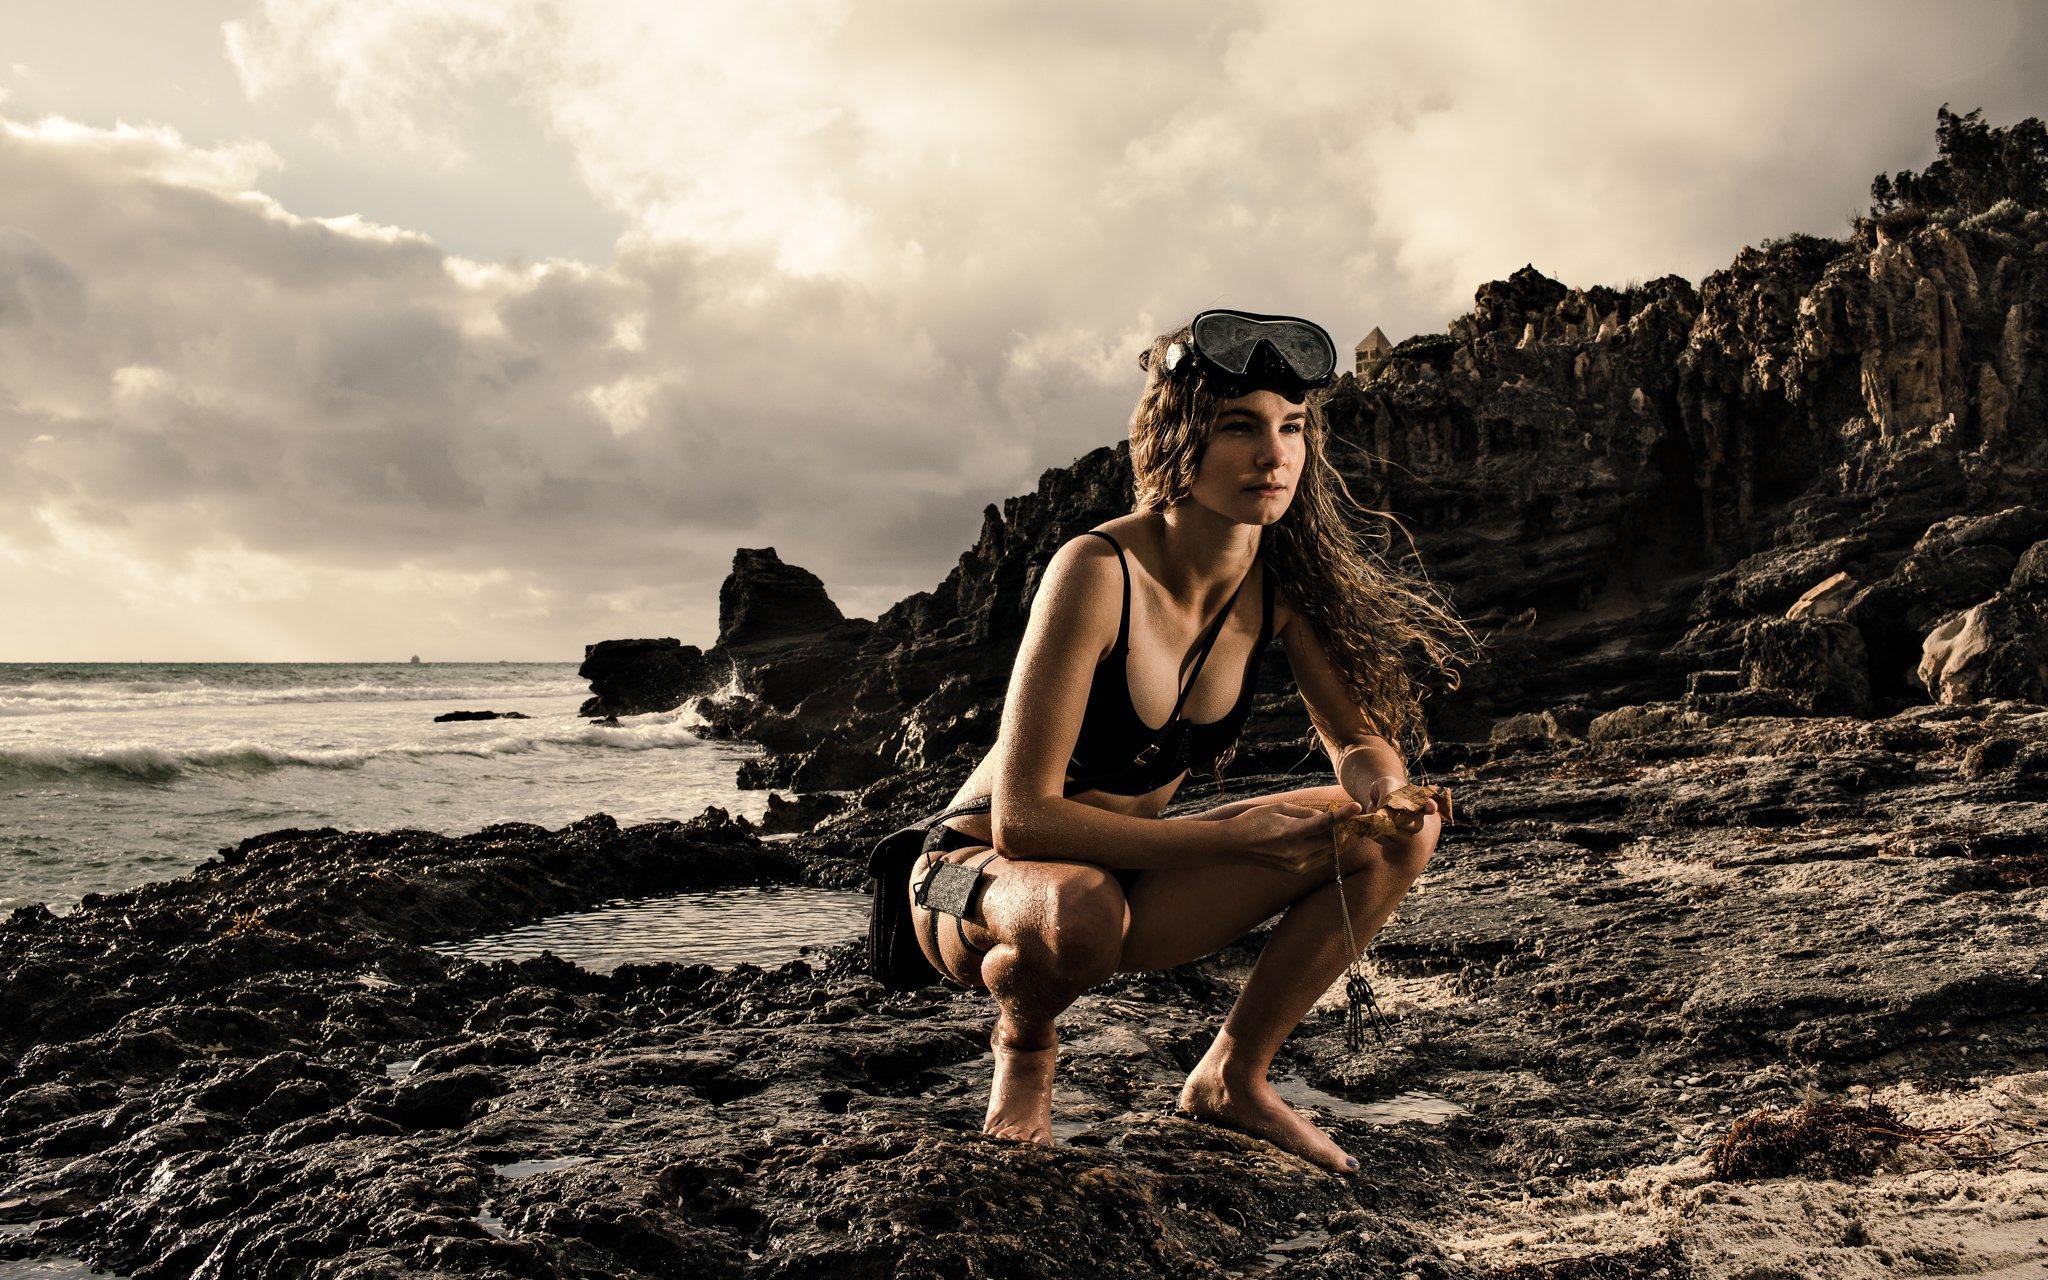 Adventure Girl – 1 – Stefanie Buma Photographer